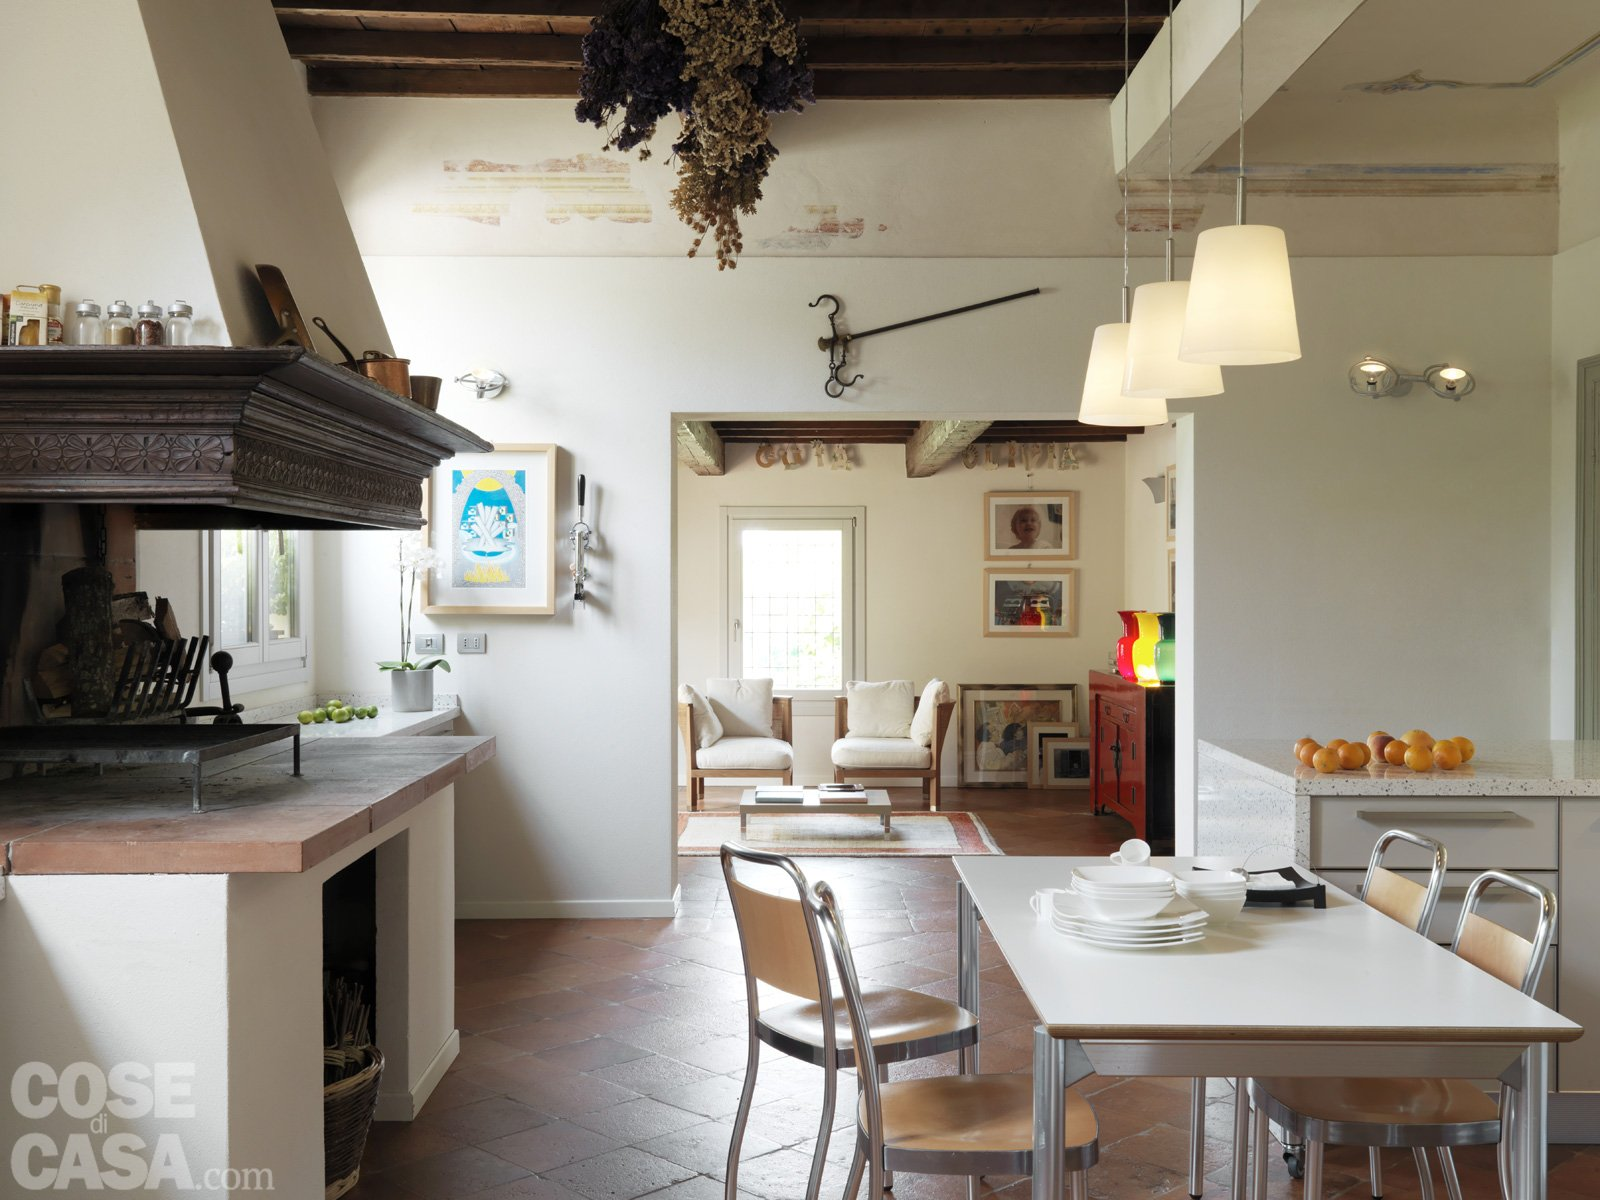 Muretti Divisori Per Cucine ~ avienix.com for .